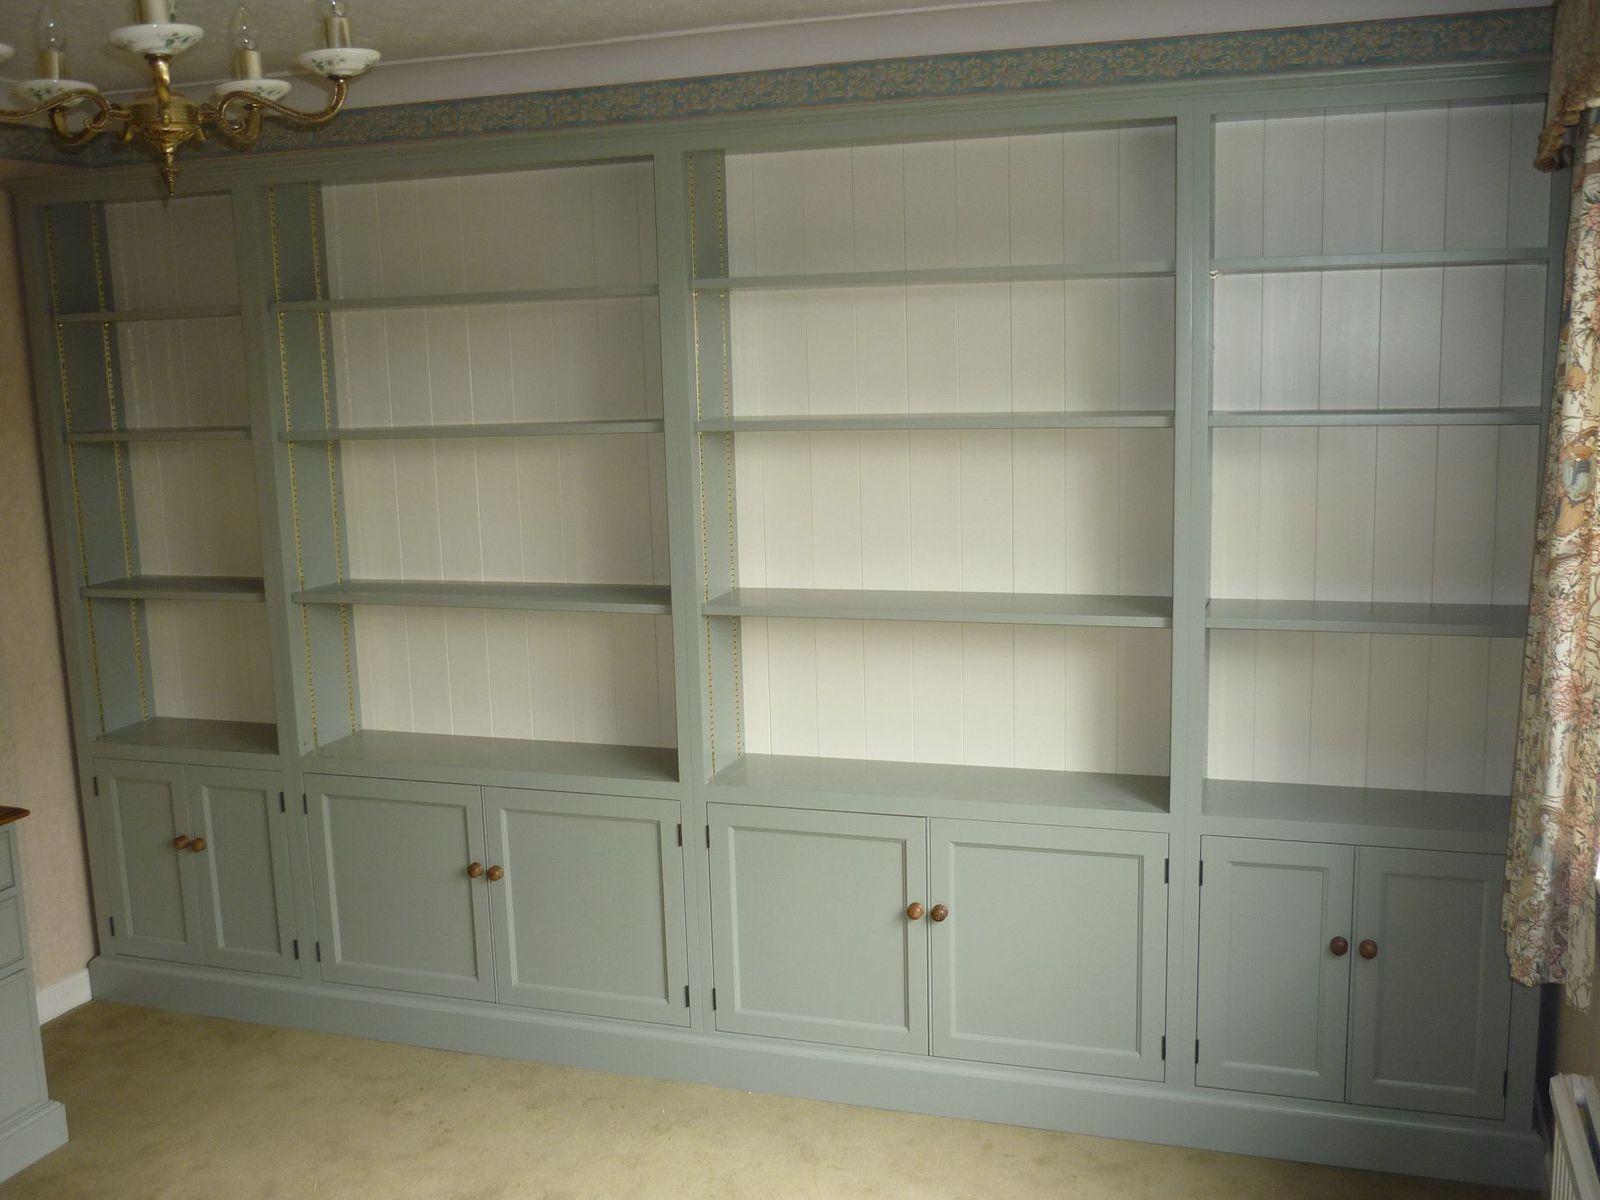 Cabinet maker bespoke pine furniture oak furniture bespoke - Bespoke Office Furniture With Huge Bookcase Painted Bookcases Pine Shop Bury